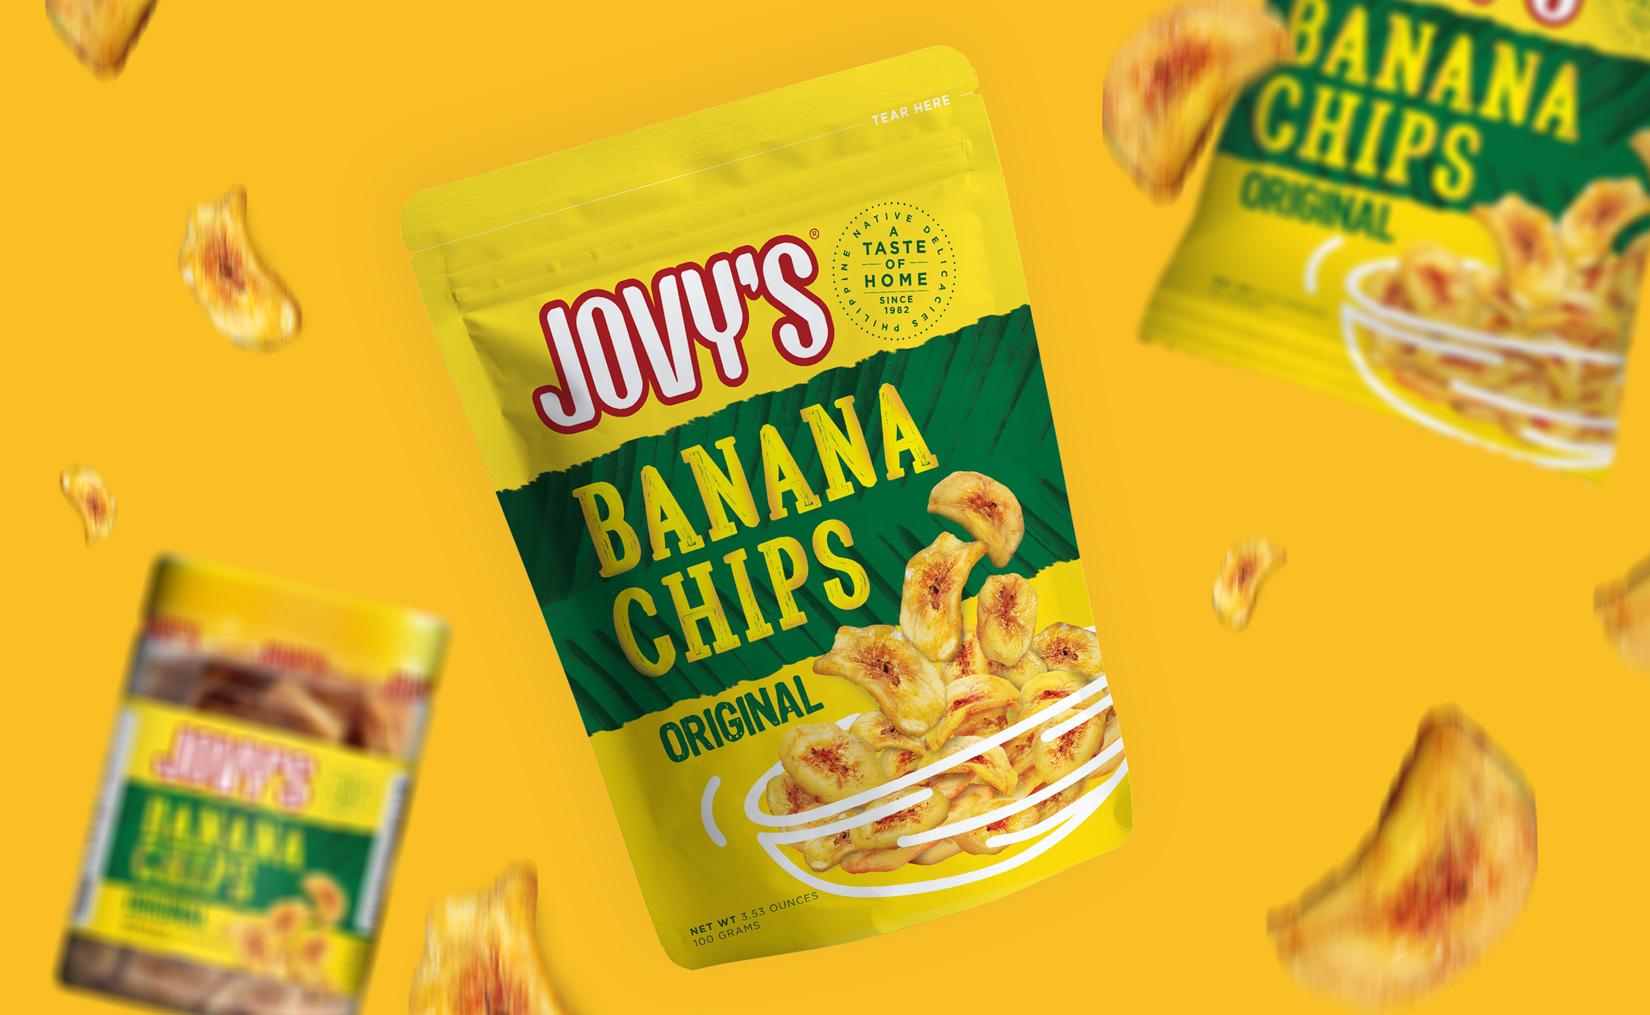 Jovy's-Products-Group-1-Banana-Chips-B